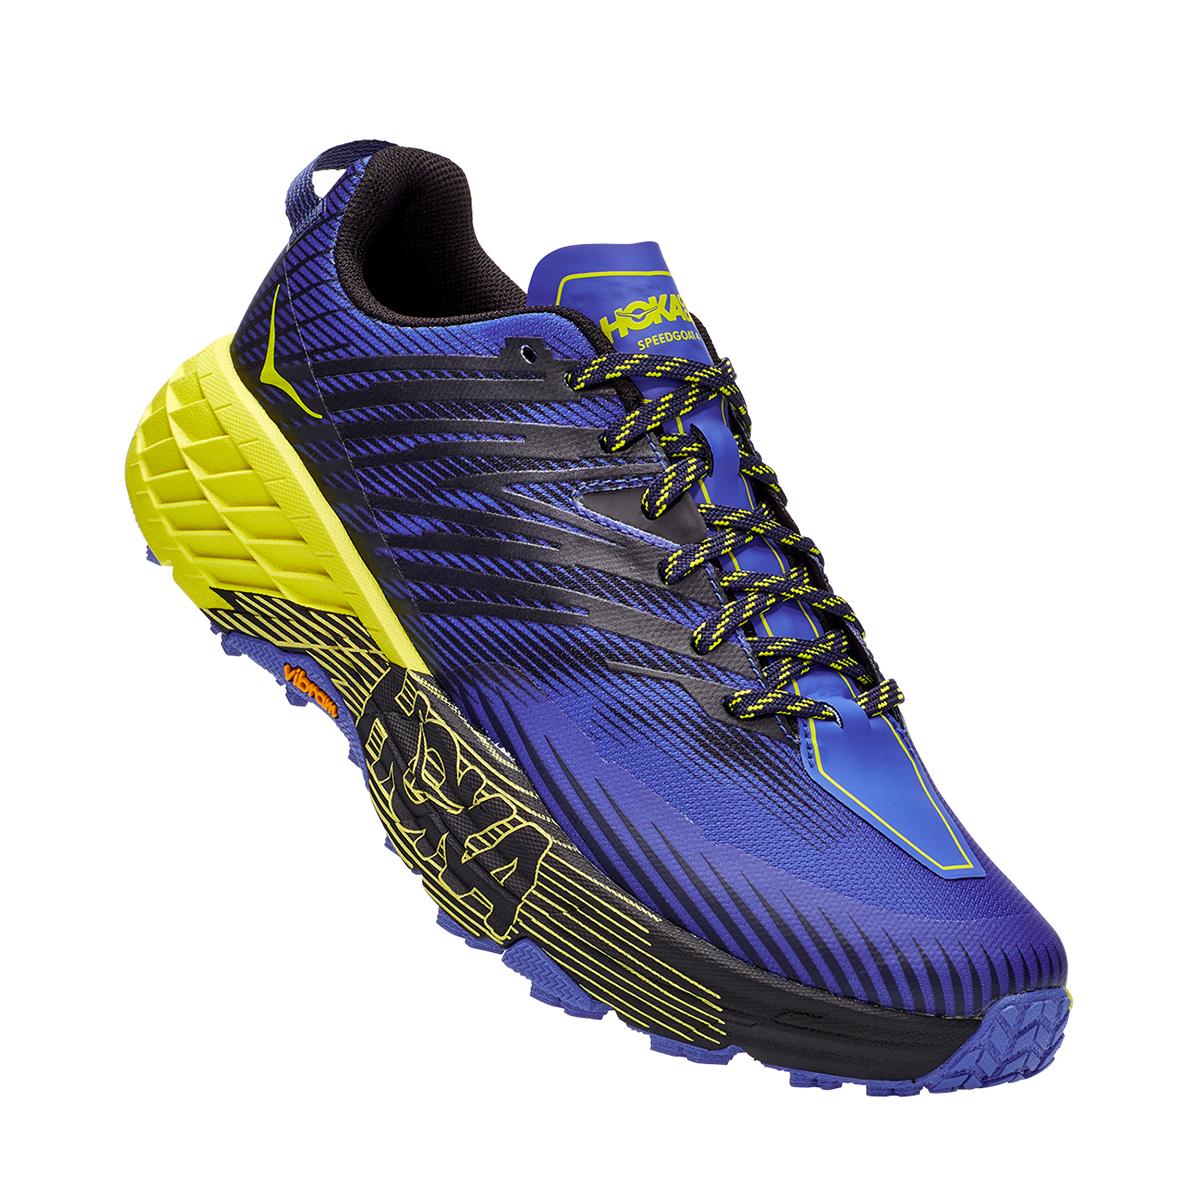 Men's Hoka One One Speedgoat 4 Trail Running Shoe - Color: Black Iris/Evening Primrose - Size: 7 - Width: Regular, Black Iris/Evening Primrose, large, image 3